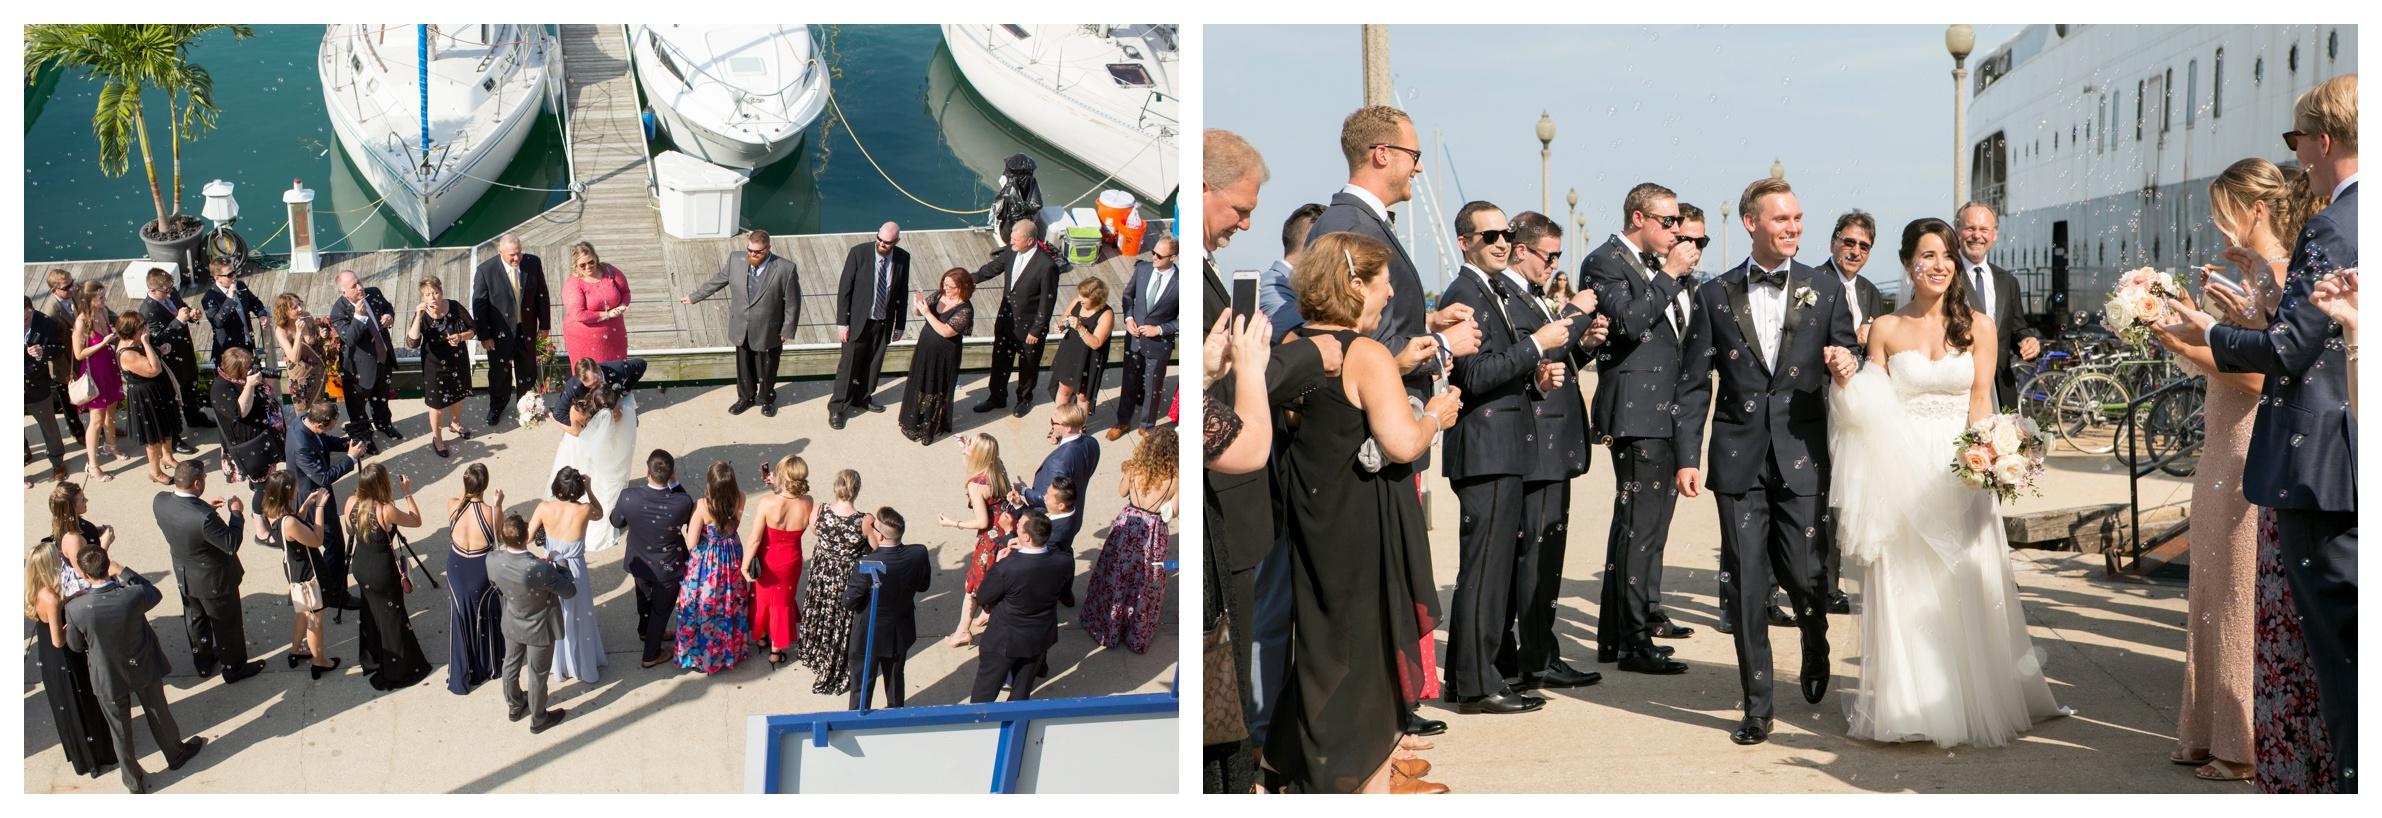 columbia-yacht-club-chicago-wedding_0026.jpg